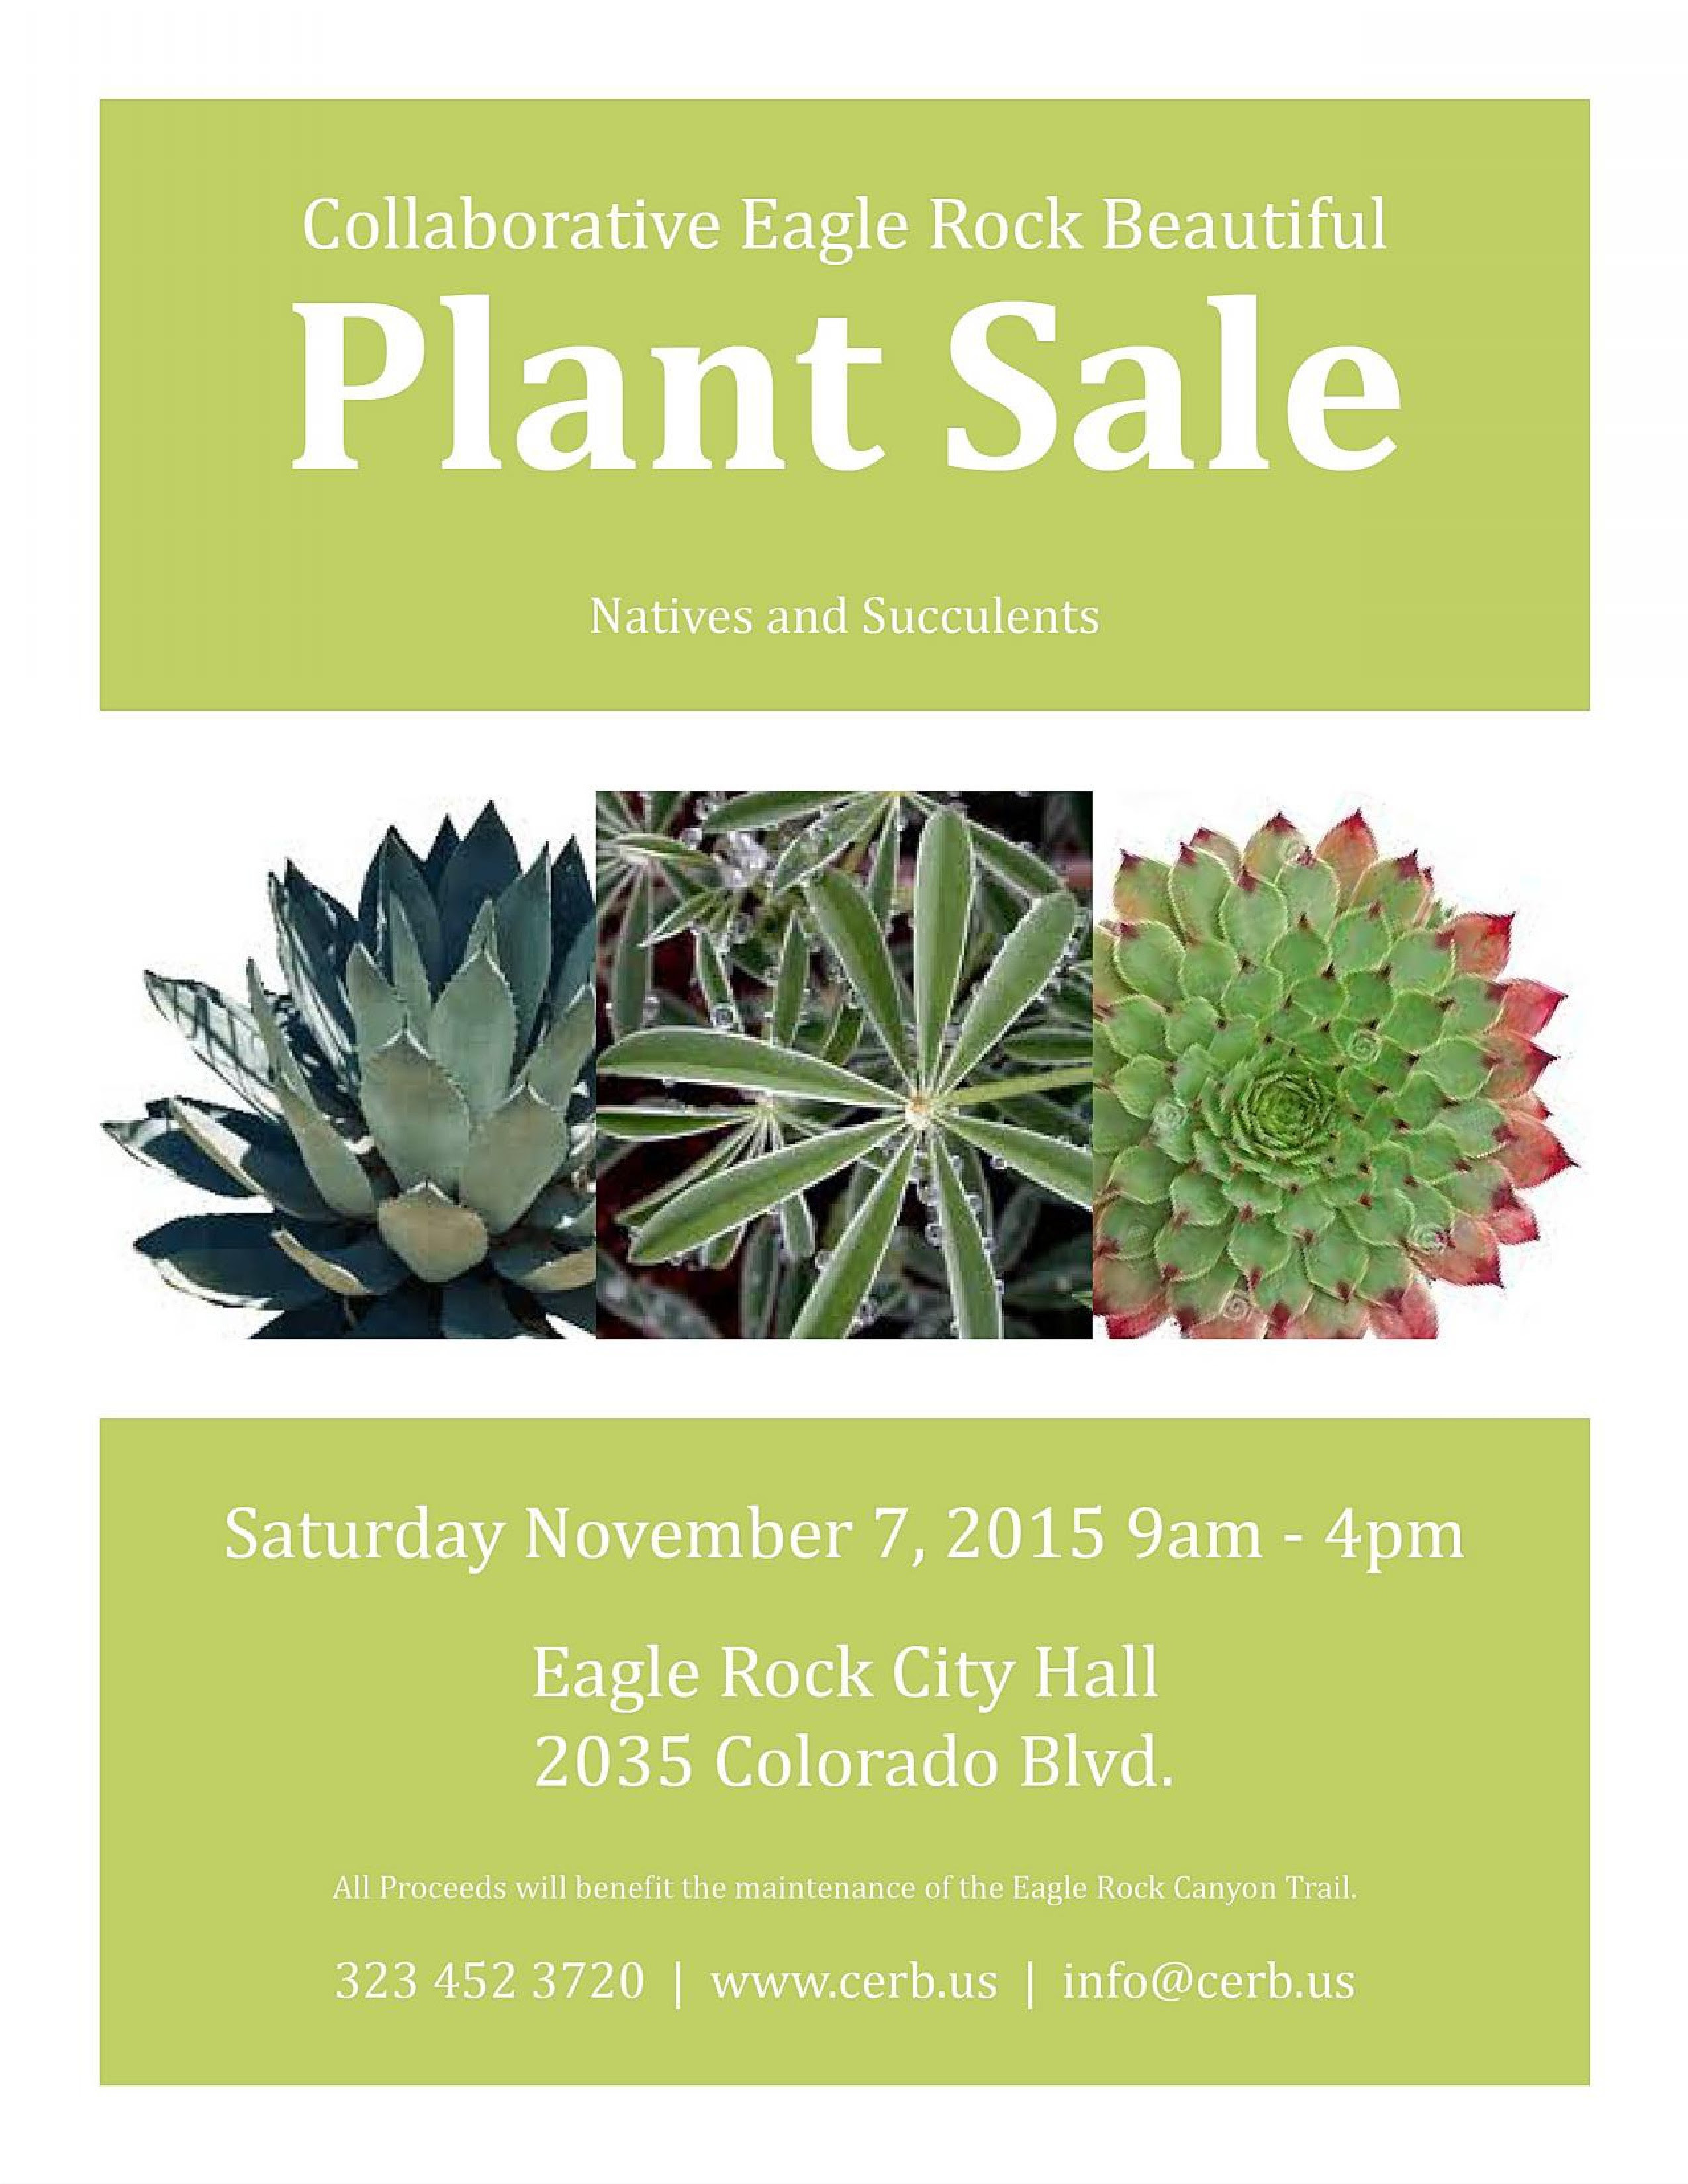 Collaborative_Eagle_Rock_Beautiful_Plant_Sale.jpg